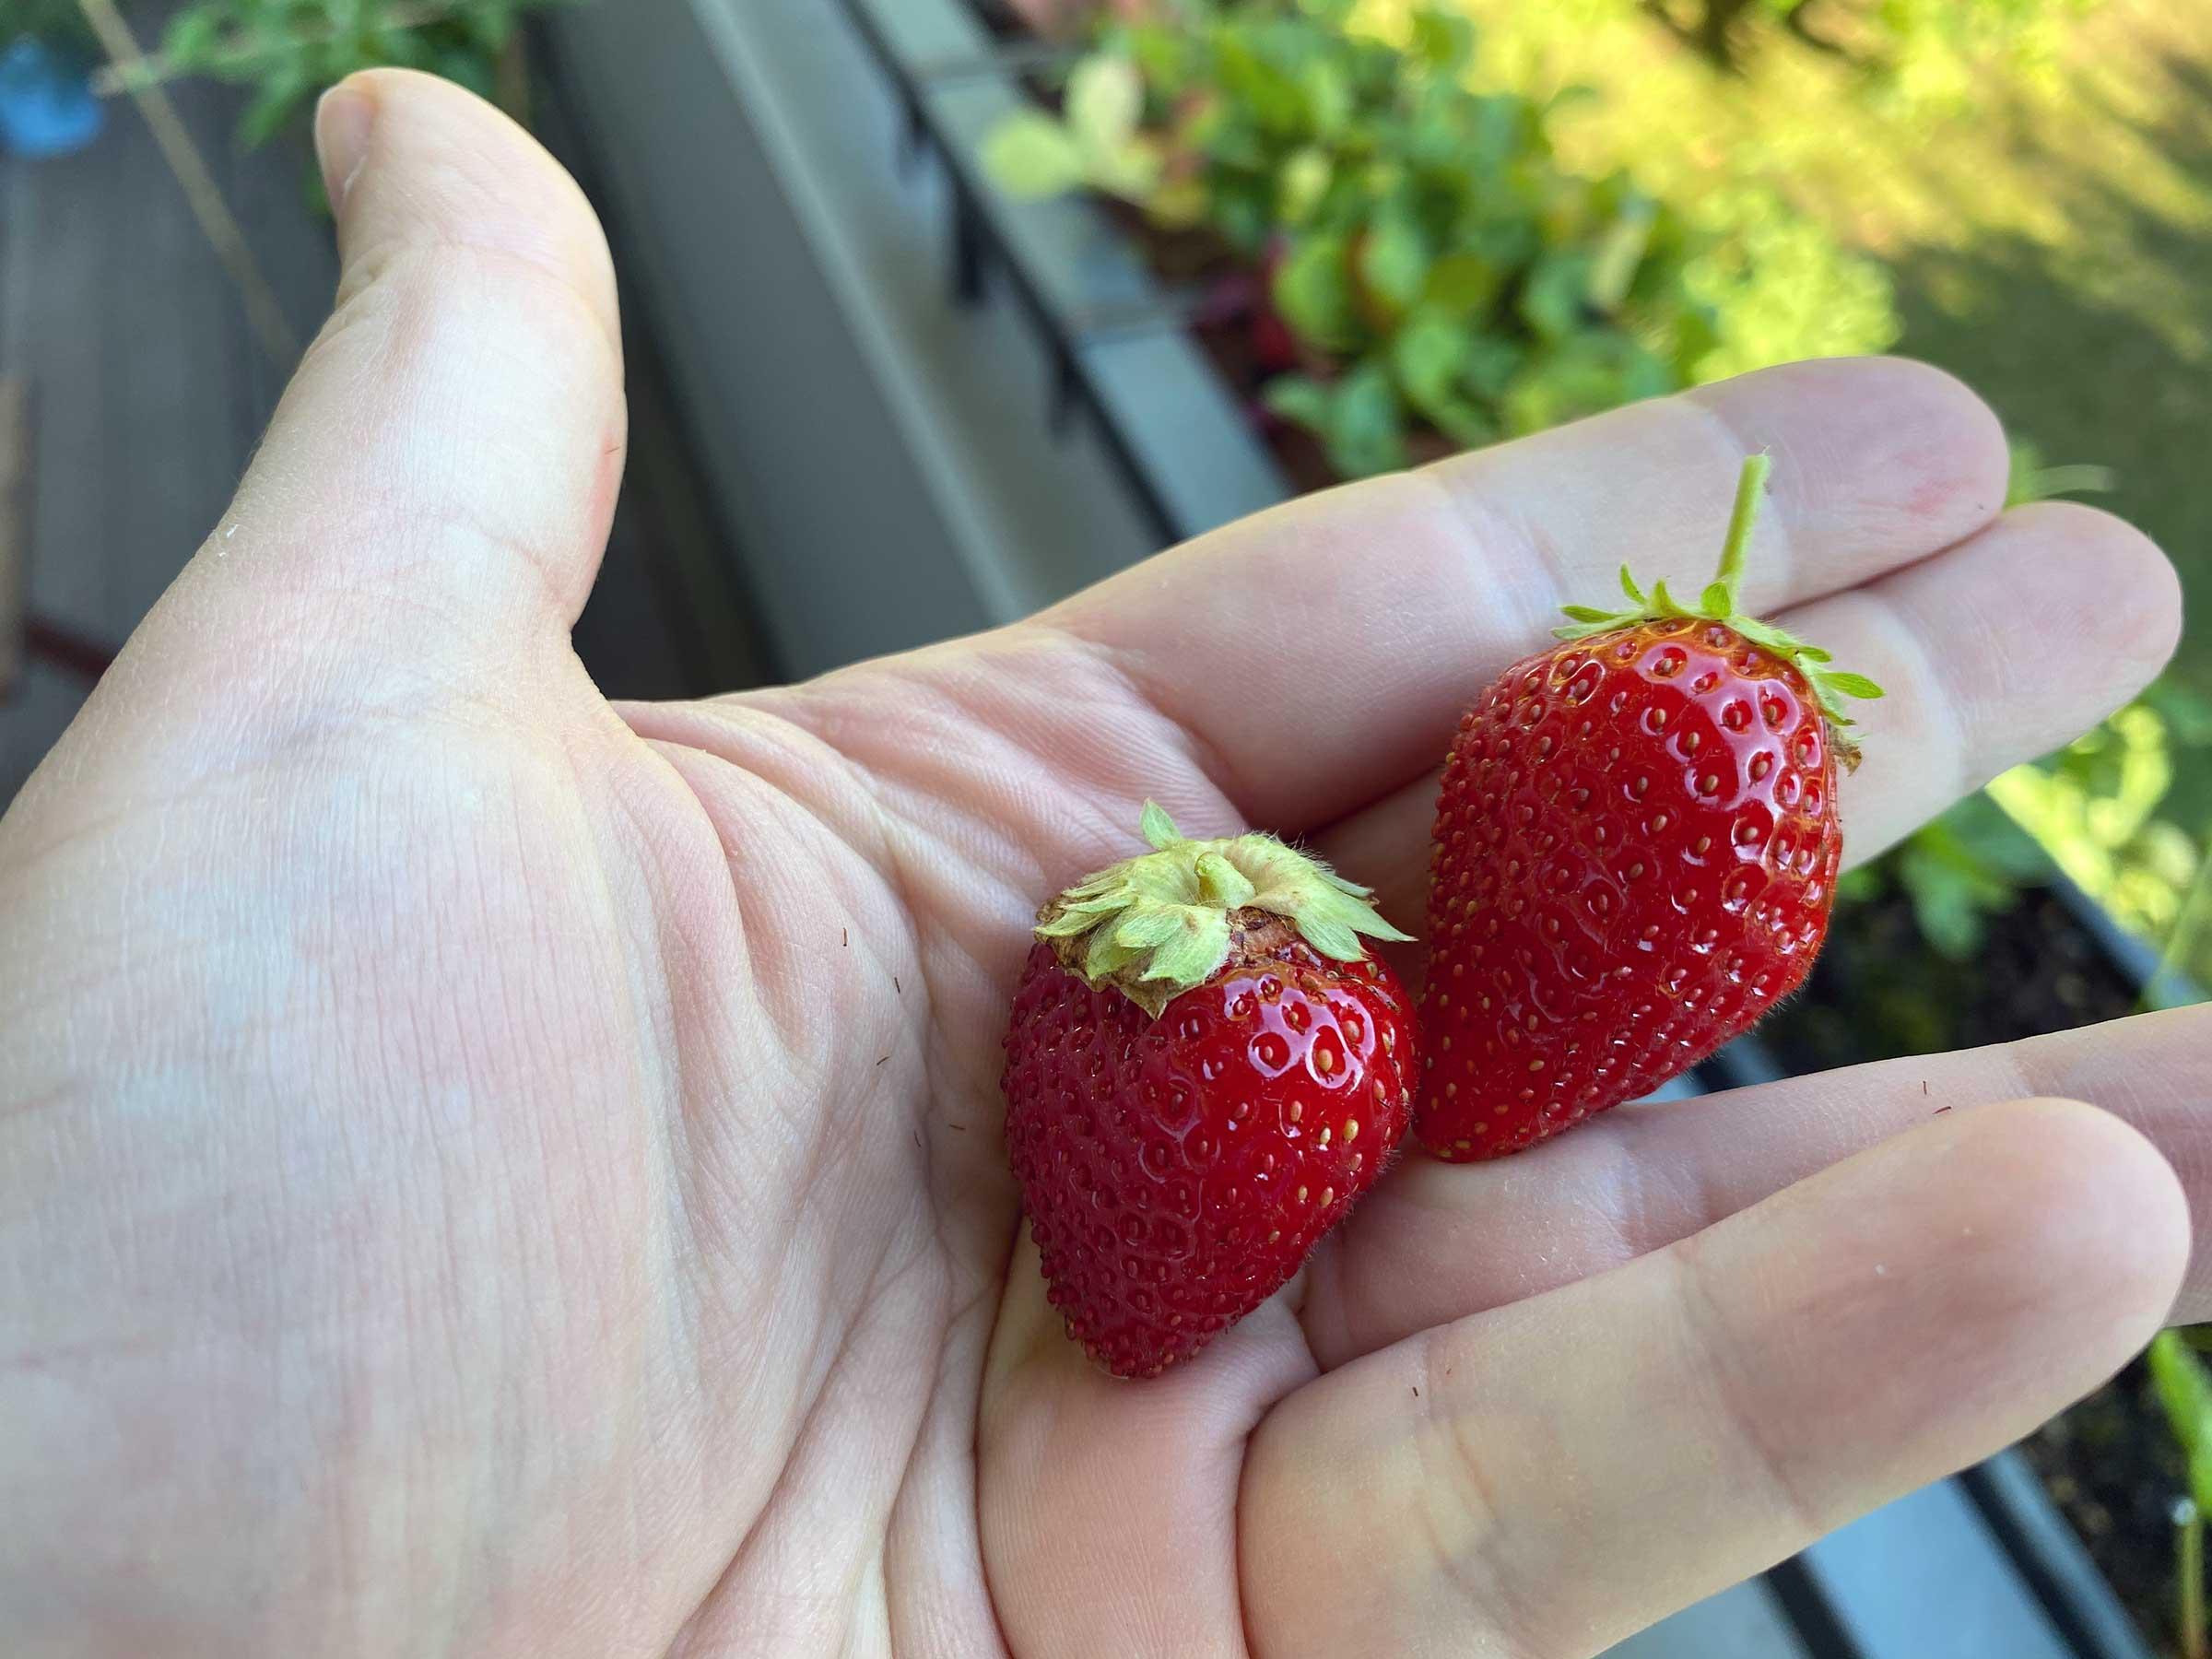 Zwei kleinere Erdbeeren in meiner Hand.